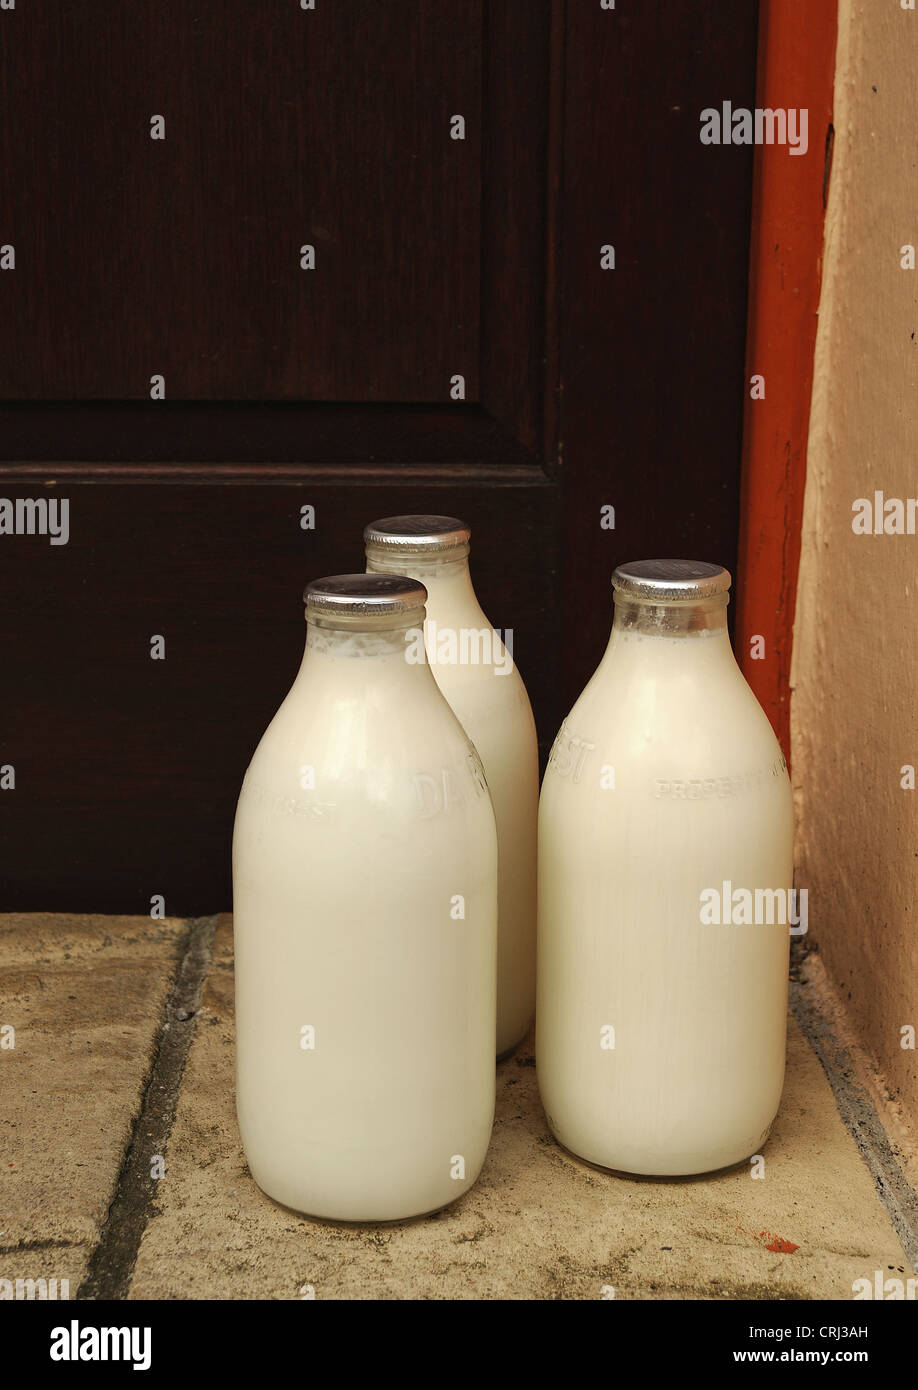 Bottles of milk on a doorstep - Stock Image